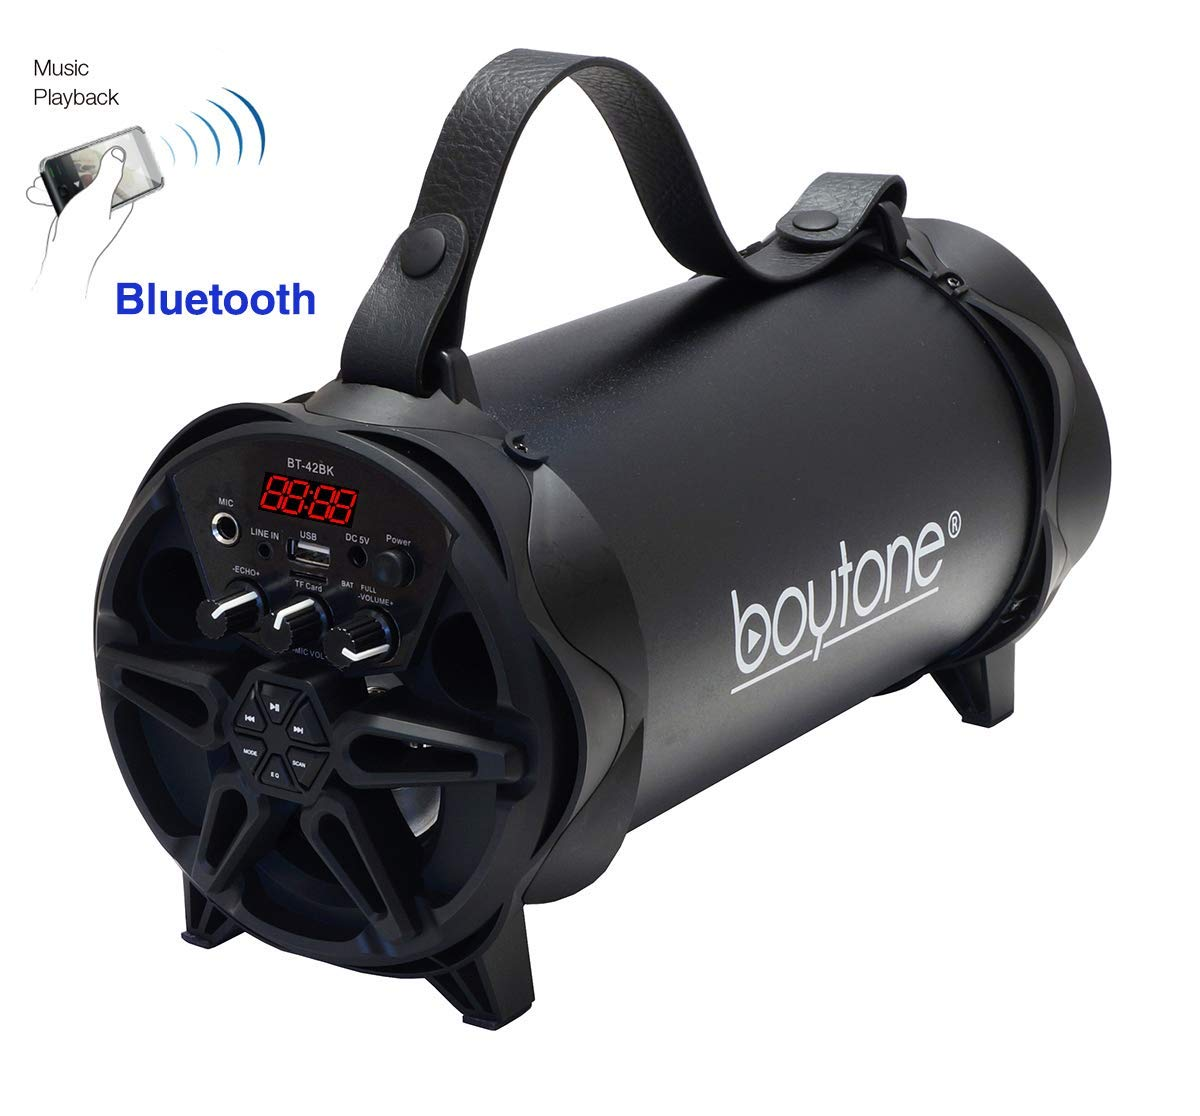 Boytone BT-42BK Portable Bluetooth Indoor/Outdoor 2.1 Hi-Fi Cylinder Loud Speaker